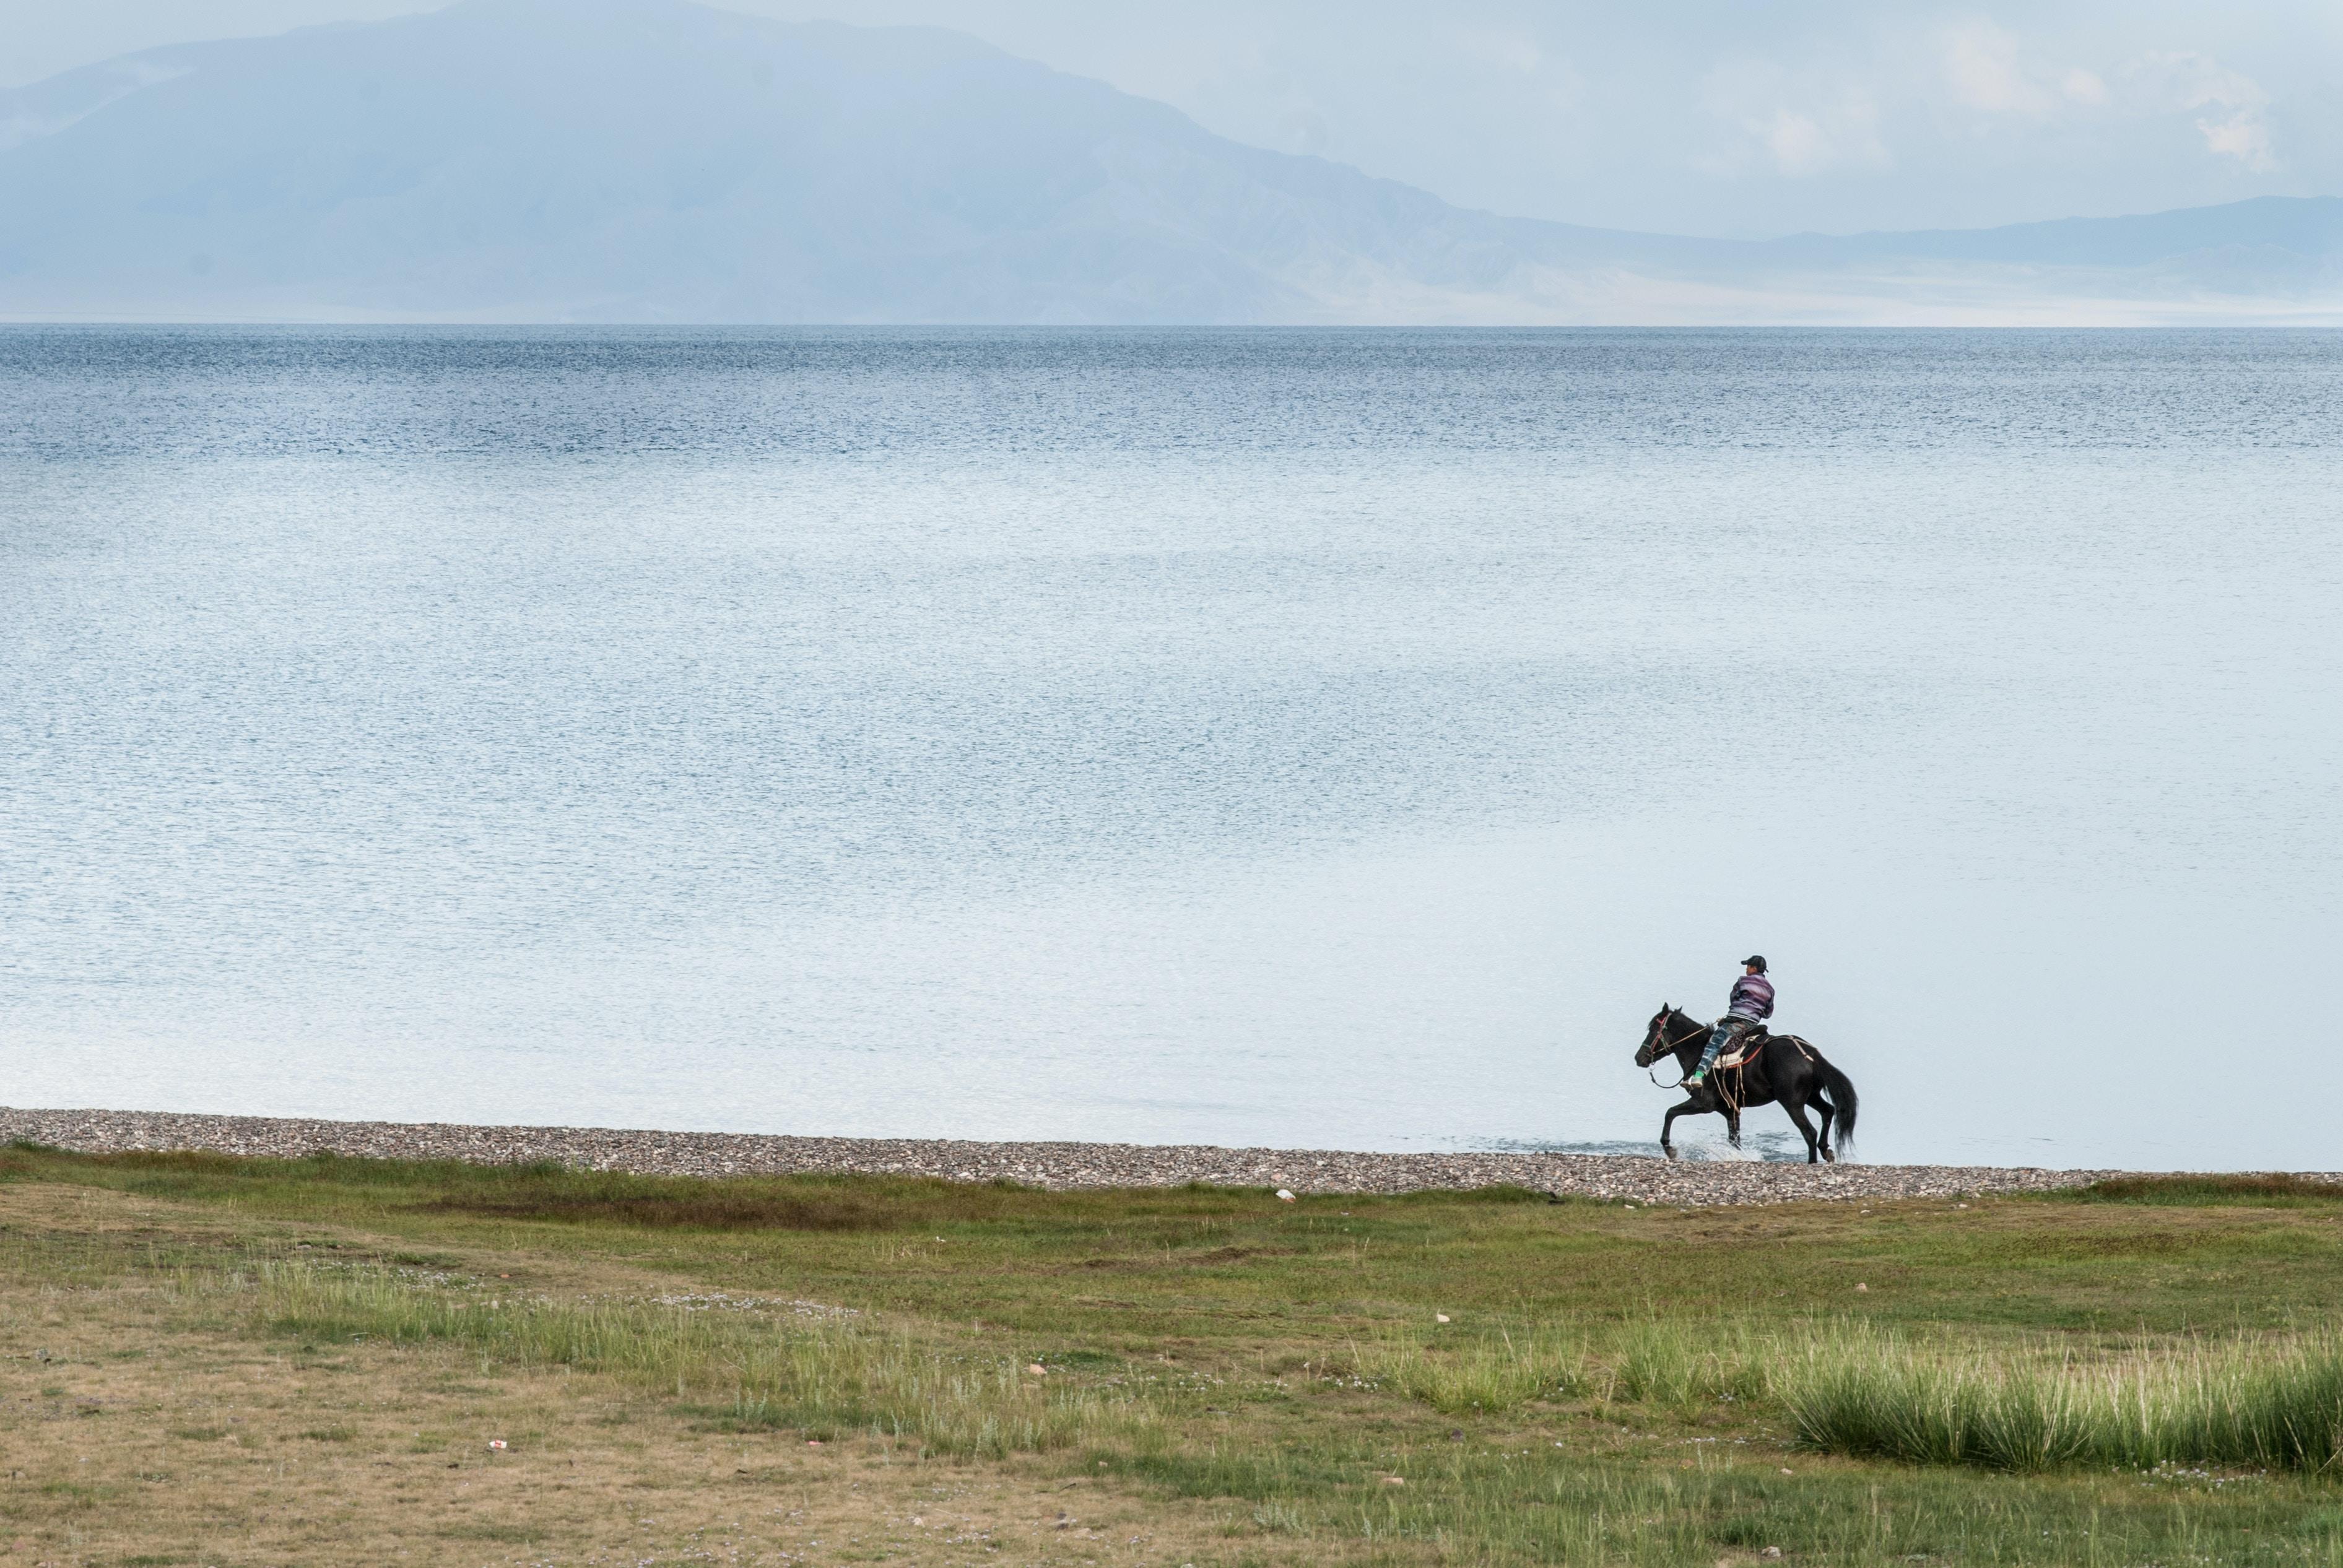 A man riding a horse through water along the shore of a vast lake